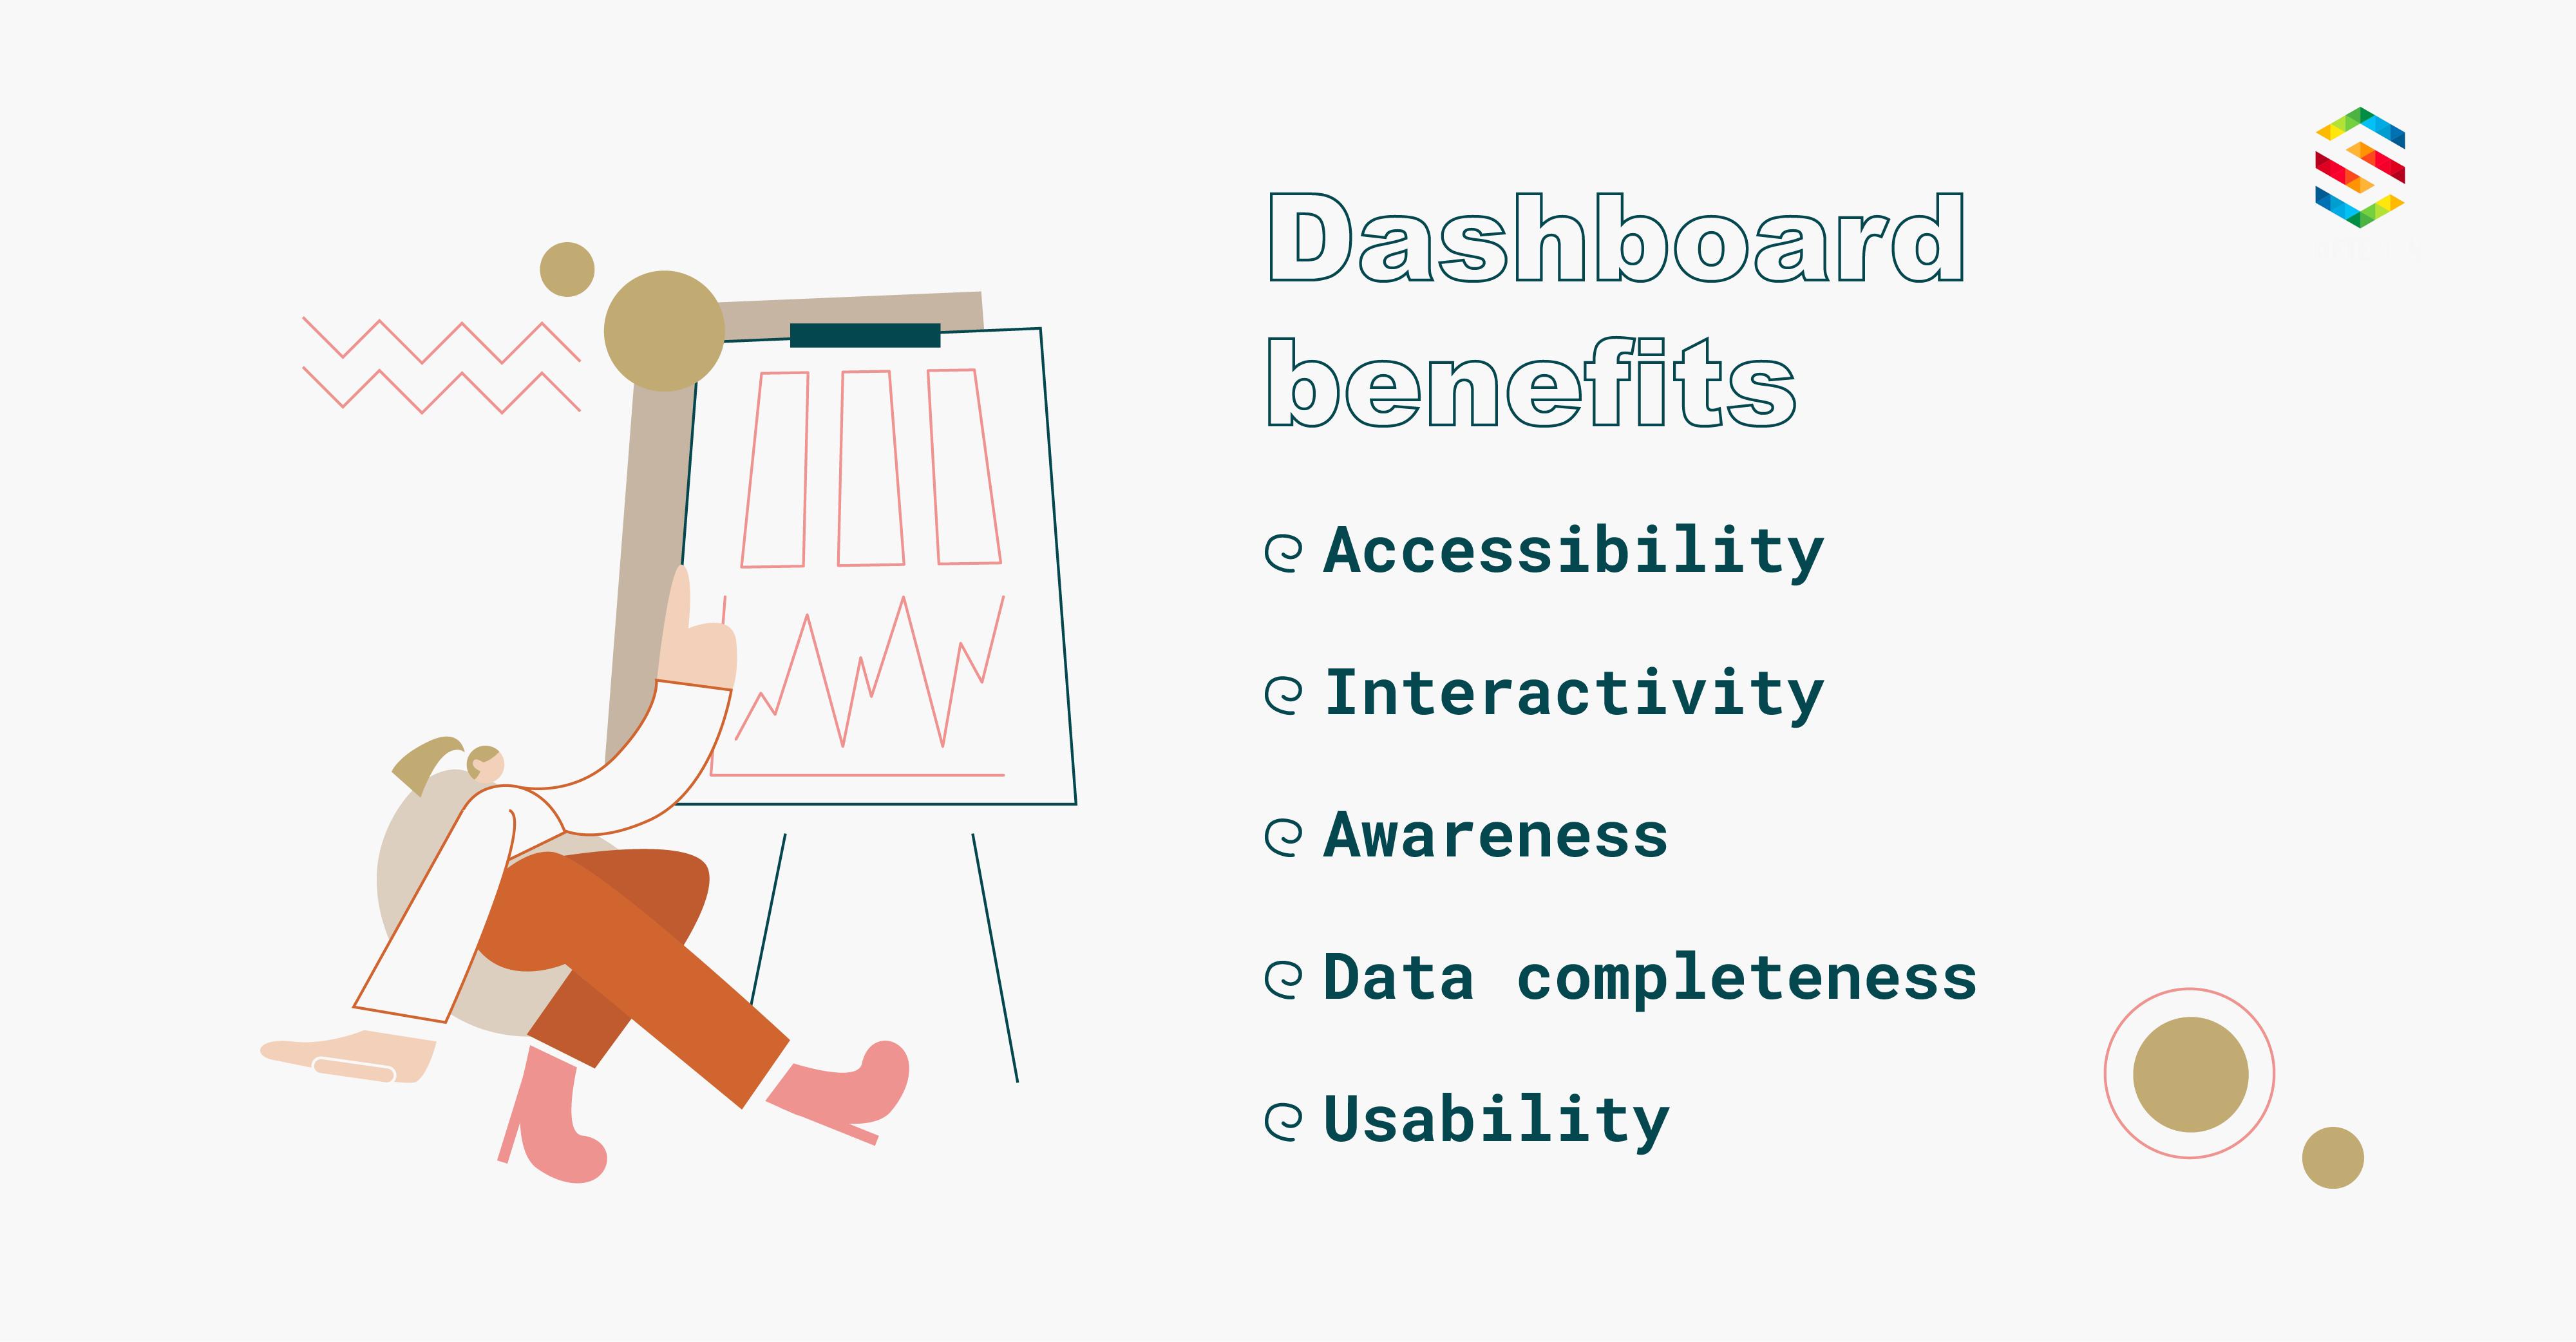 Dashboard benefits